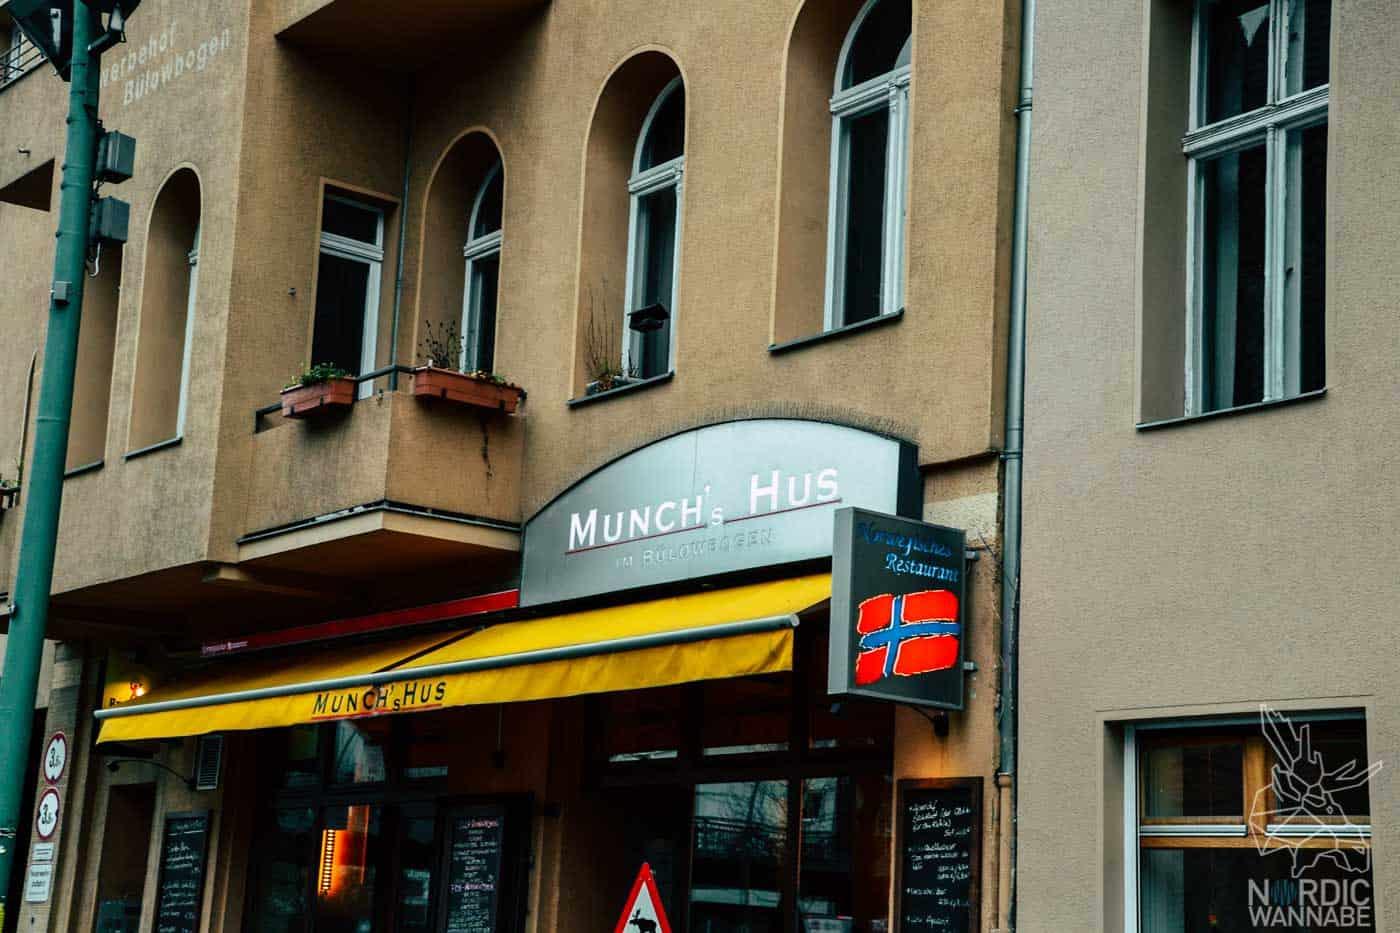 Skandinavisch essen Berlin, Skandinavisch shoppen Berlin, Skandinavien in Berlin, Munchs Hus